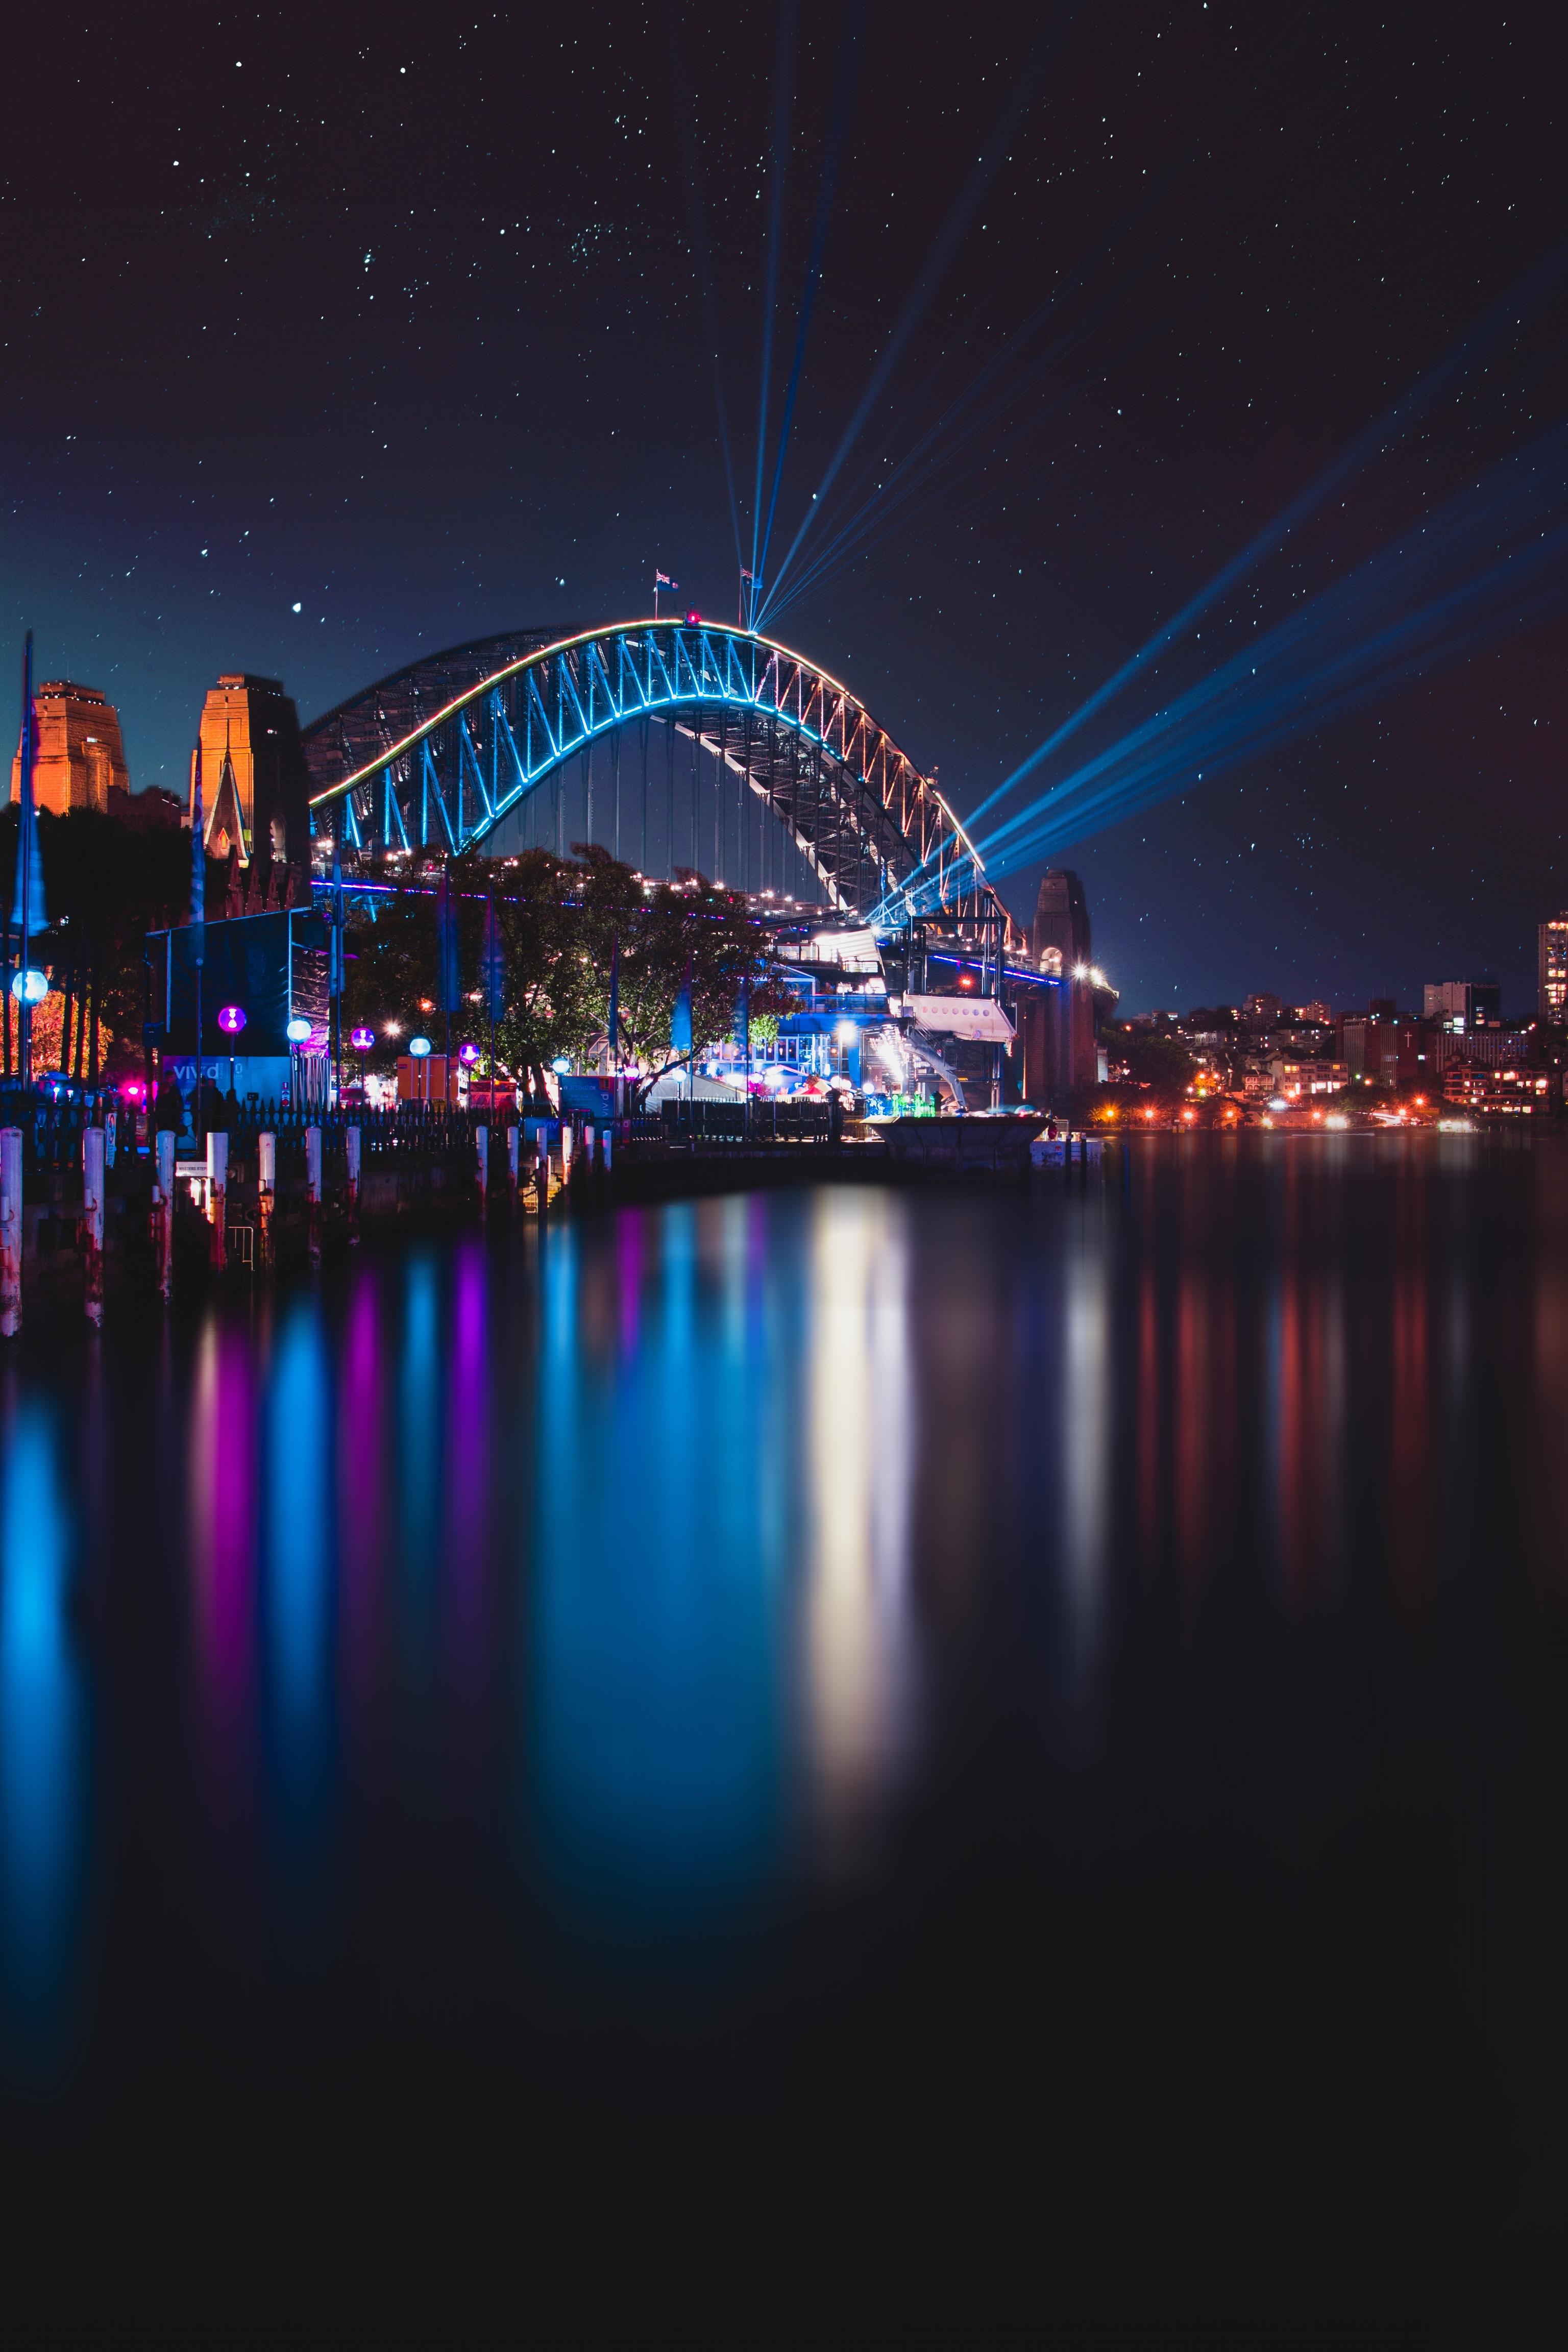 143588 Screensavers and Wallpapers Night City for phone. Download Cities, Sydney, Night City, City Lights, Bridge, Australia, Harbor Bridge, Harbour Bridge pictures for free